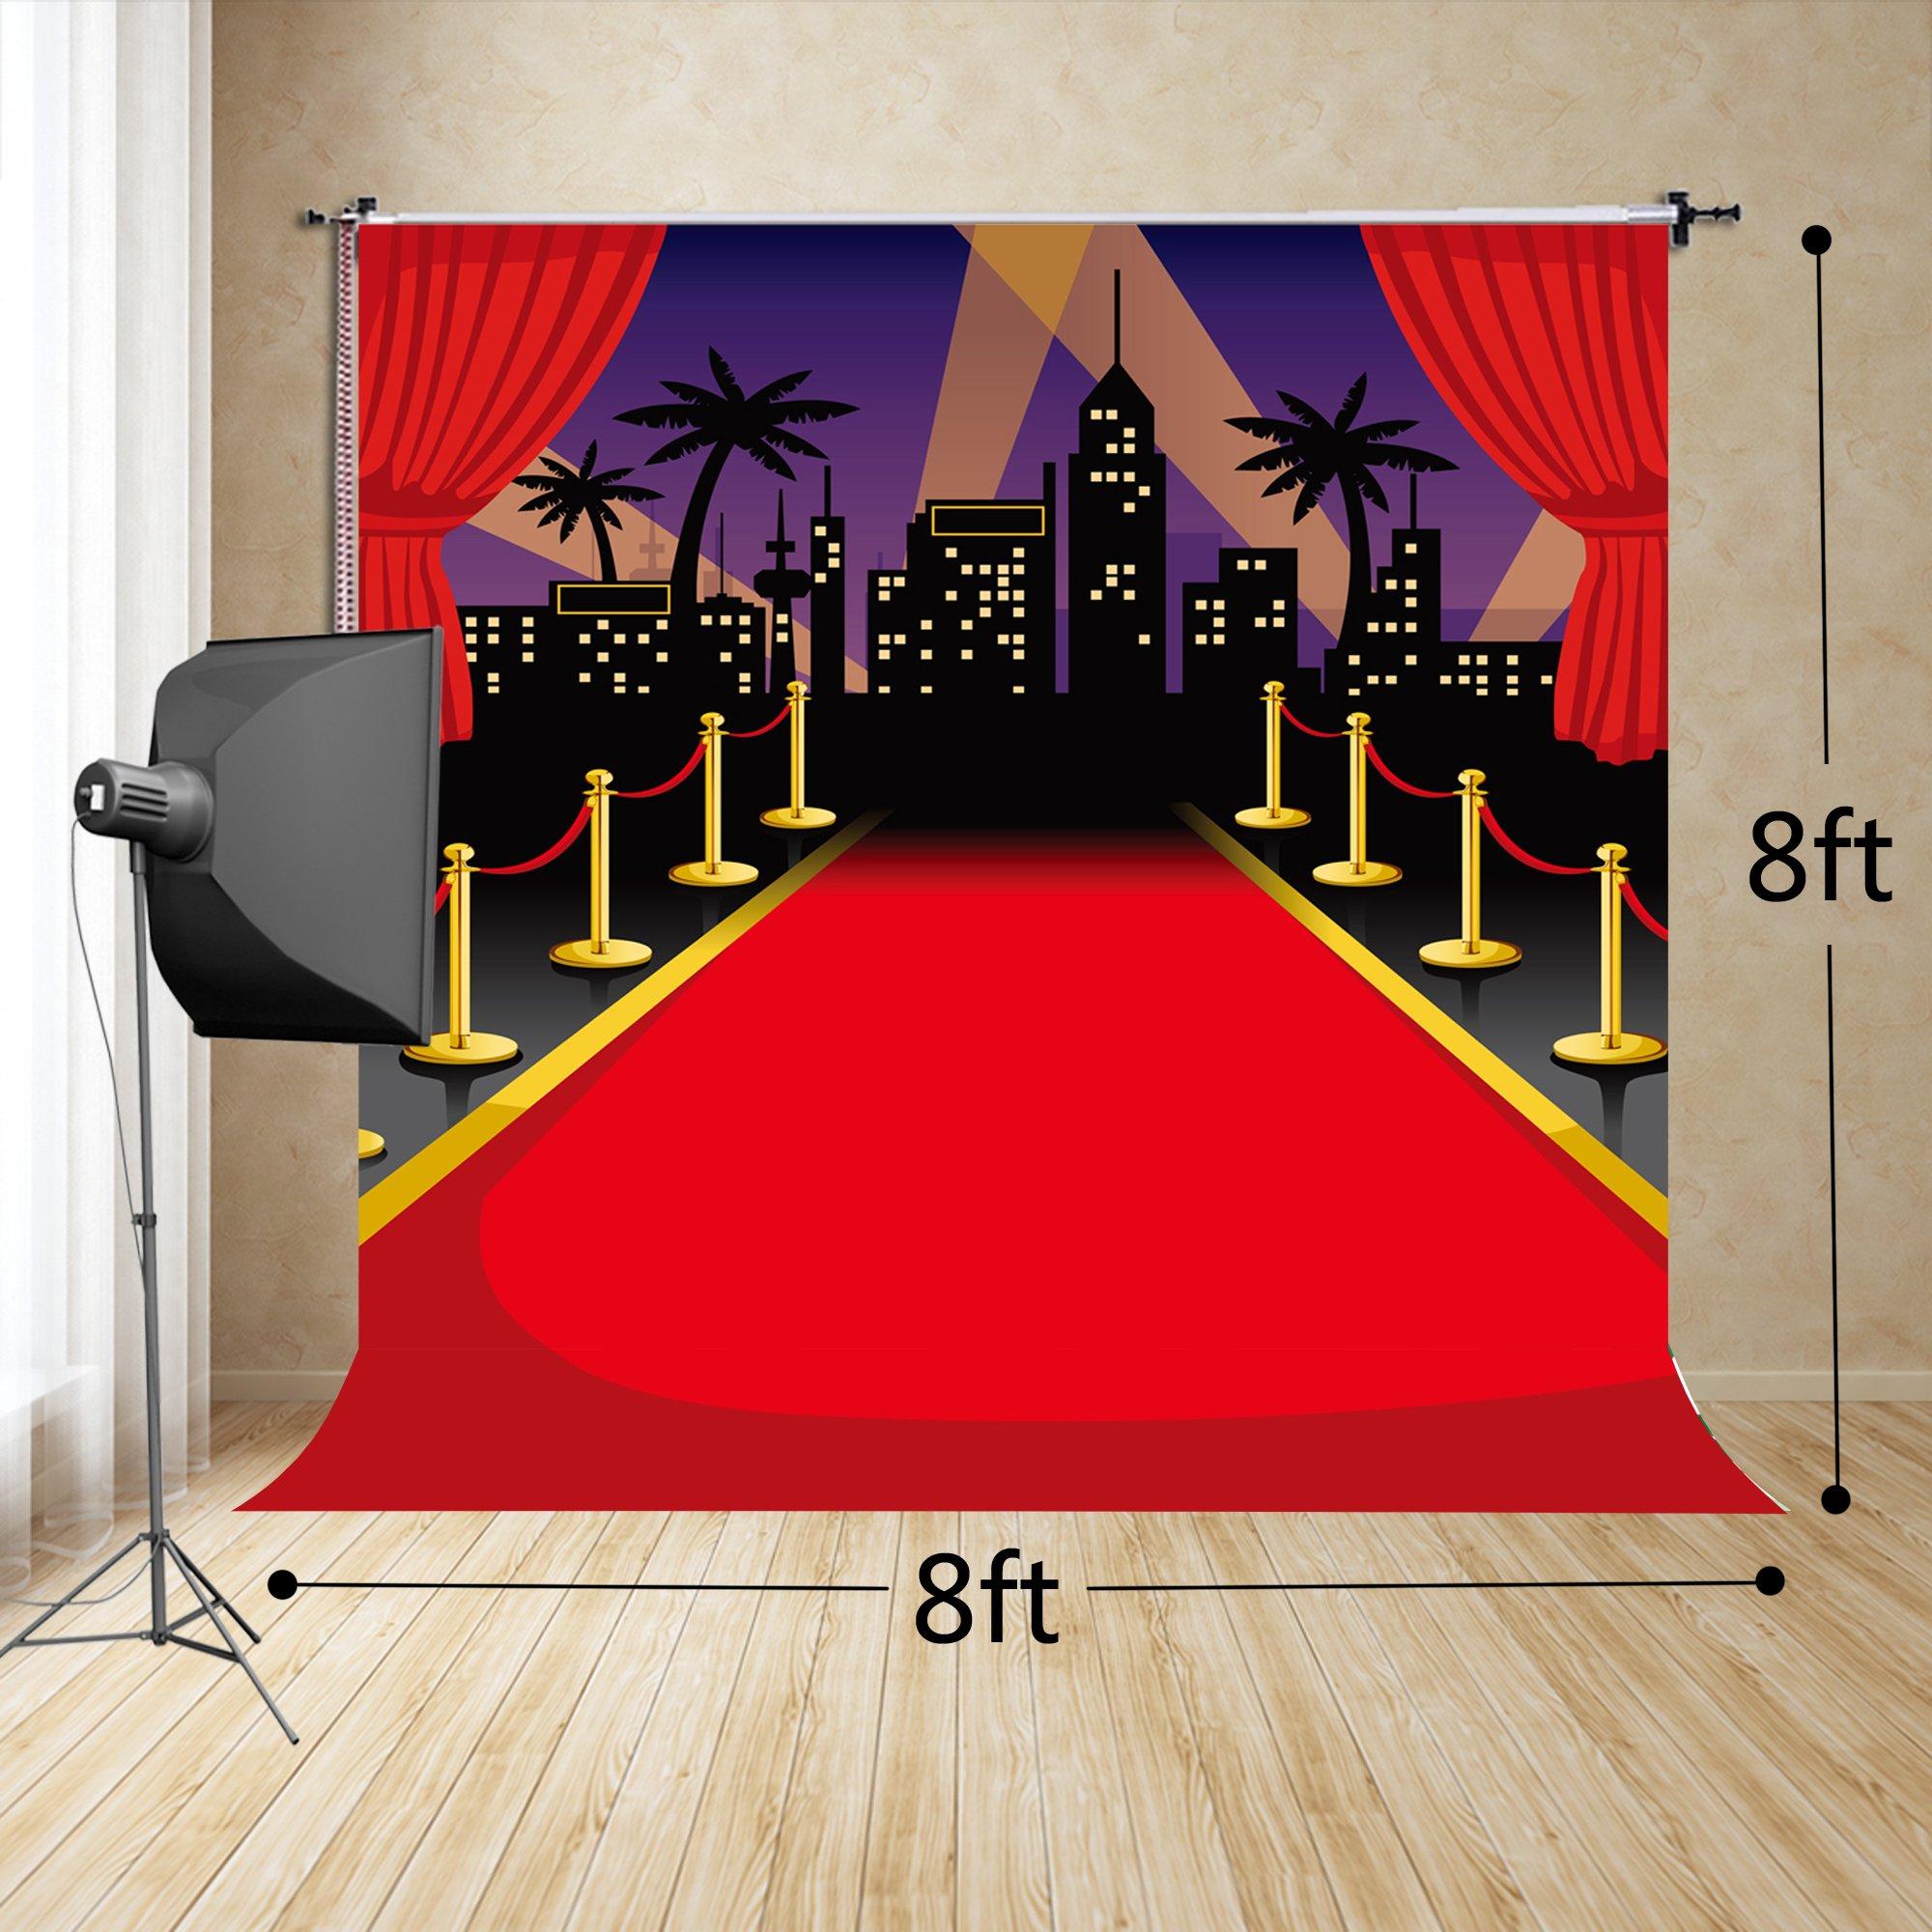 Amazon Com Fivan Us 8x8ft 250x250cm Red Carpet Cartoon Stage For Baby Children Birthday Photos Fd 3226 Electronics